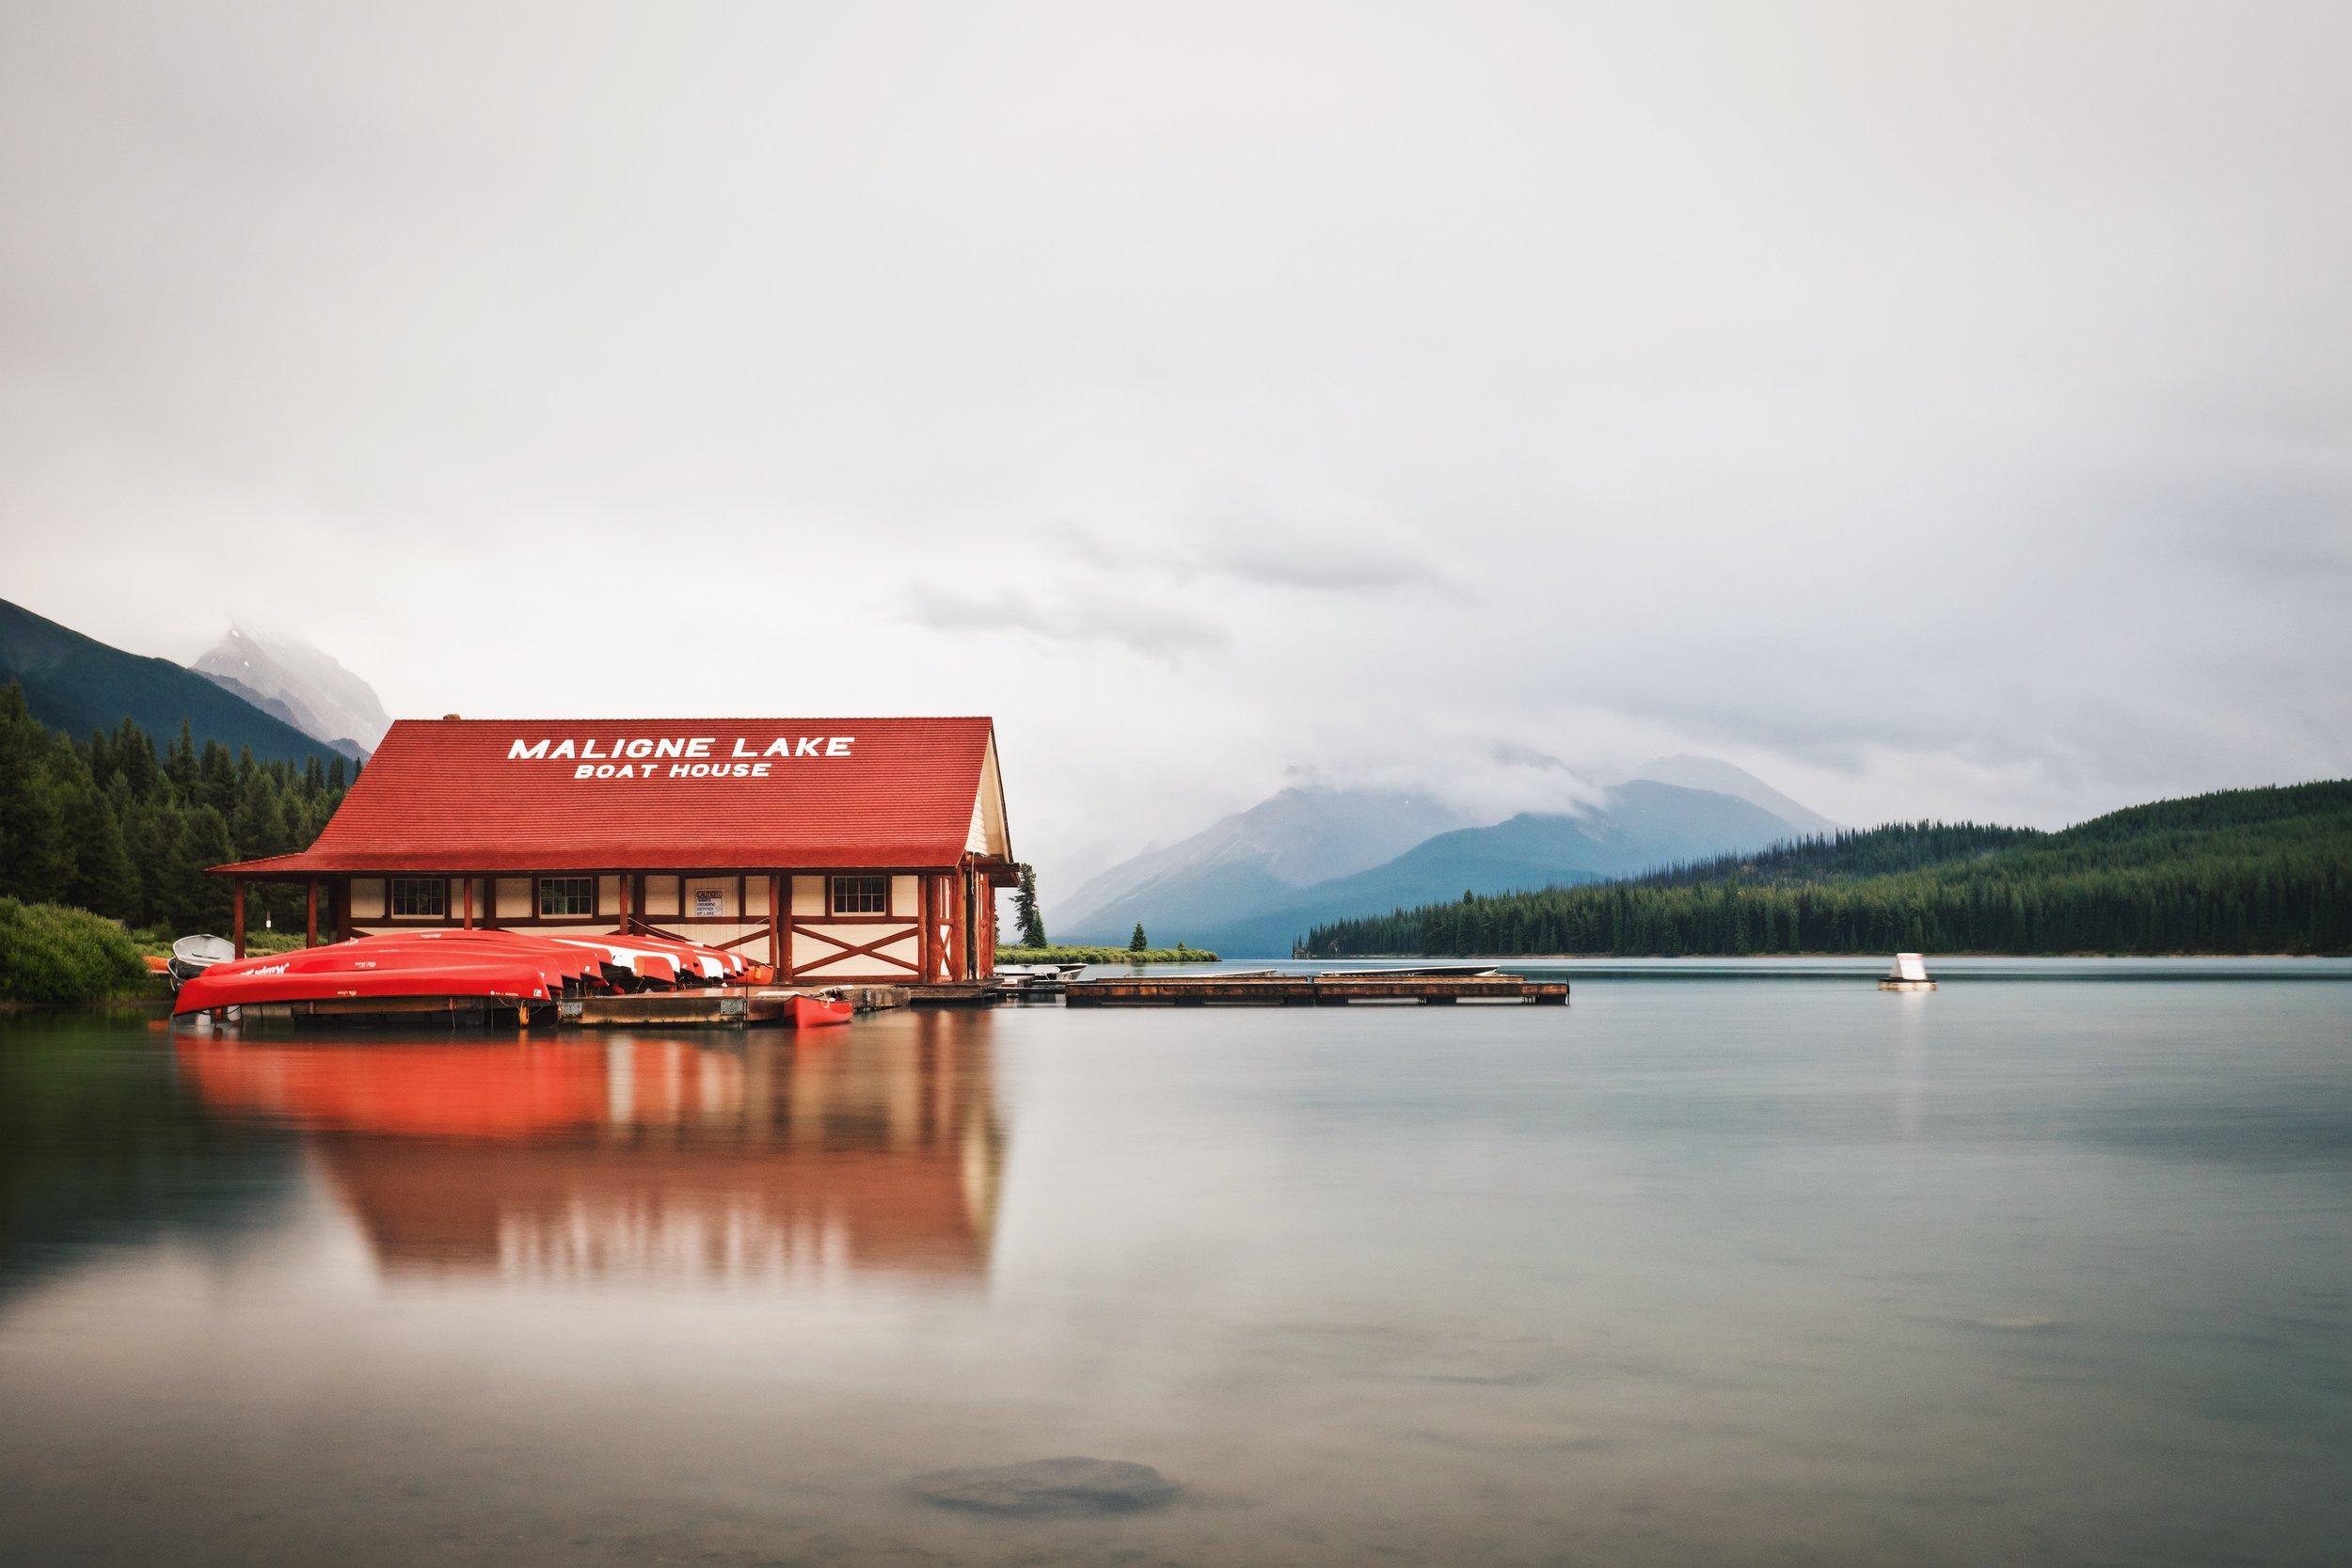 Maligne Lake Boat Dock - Jasper National Park